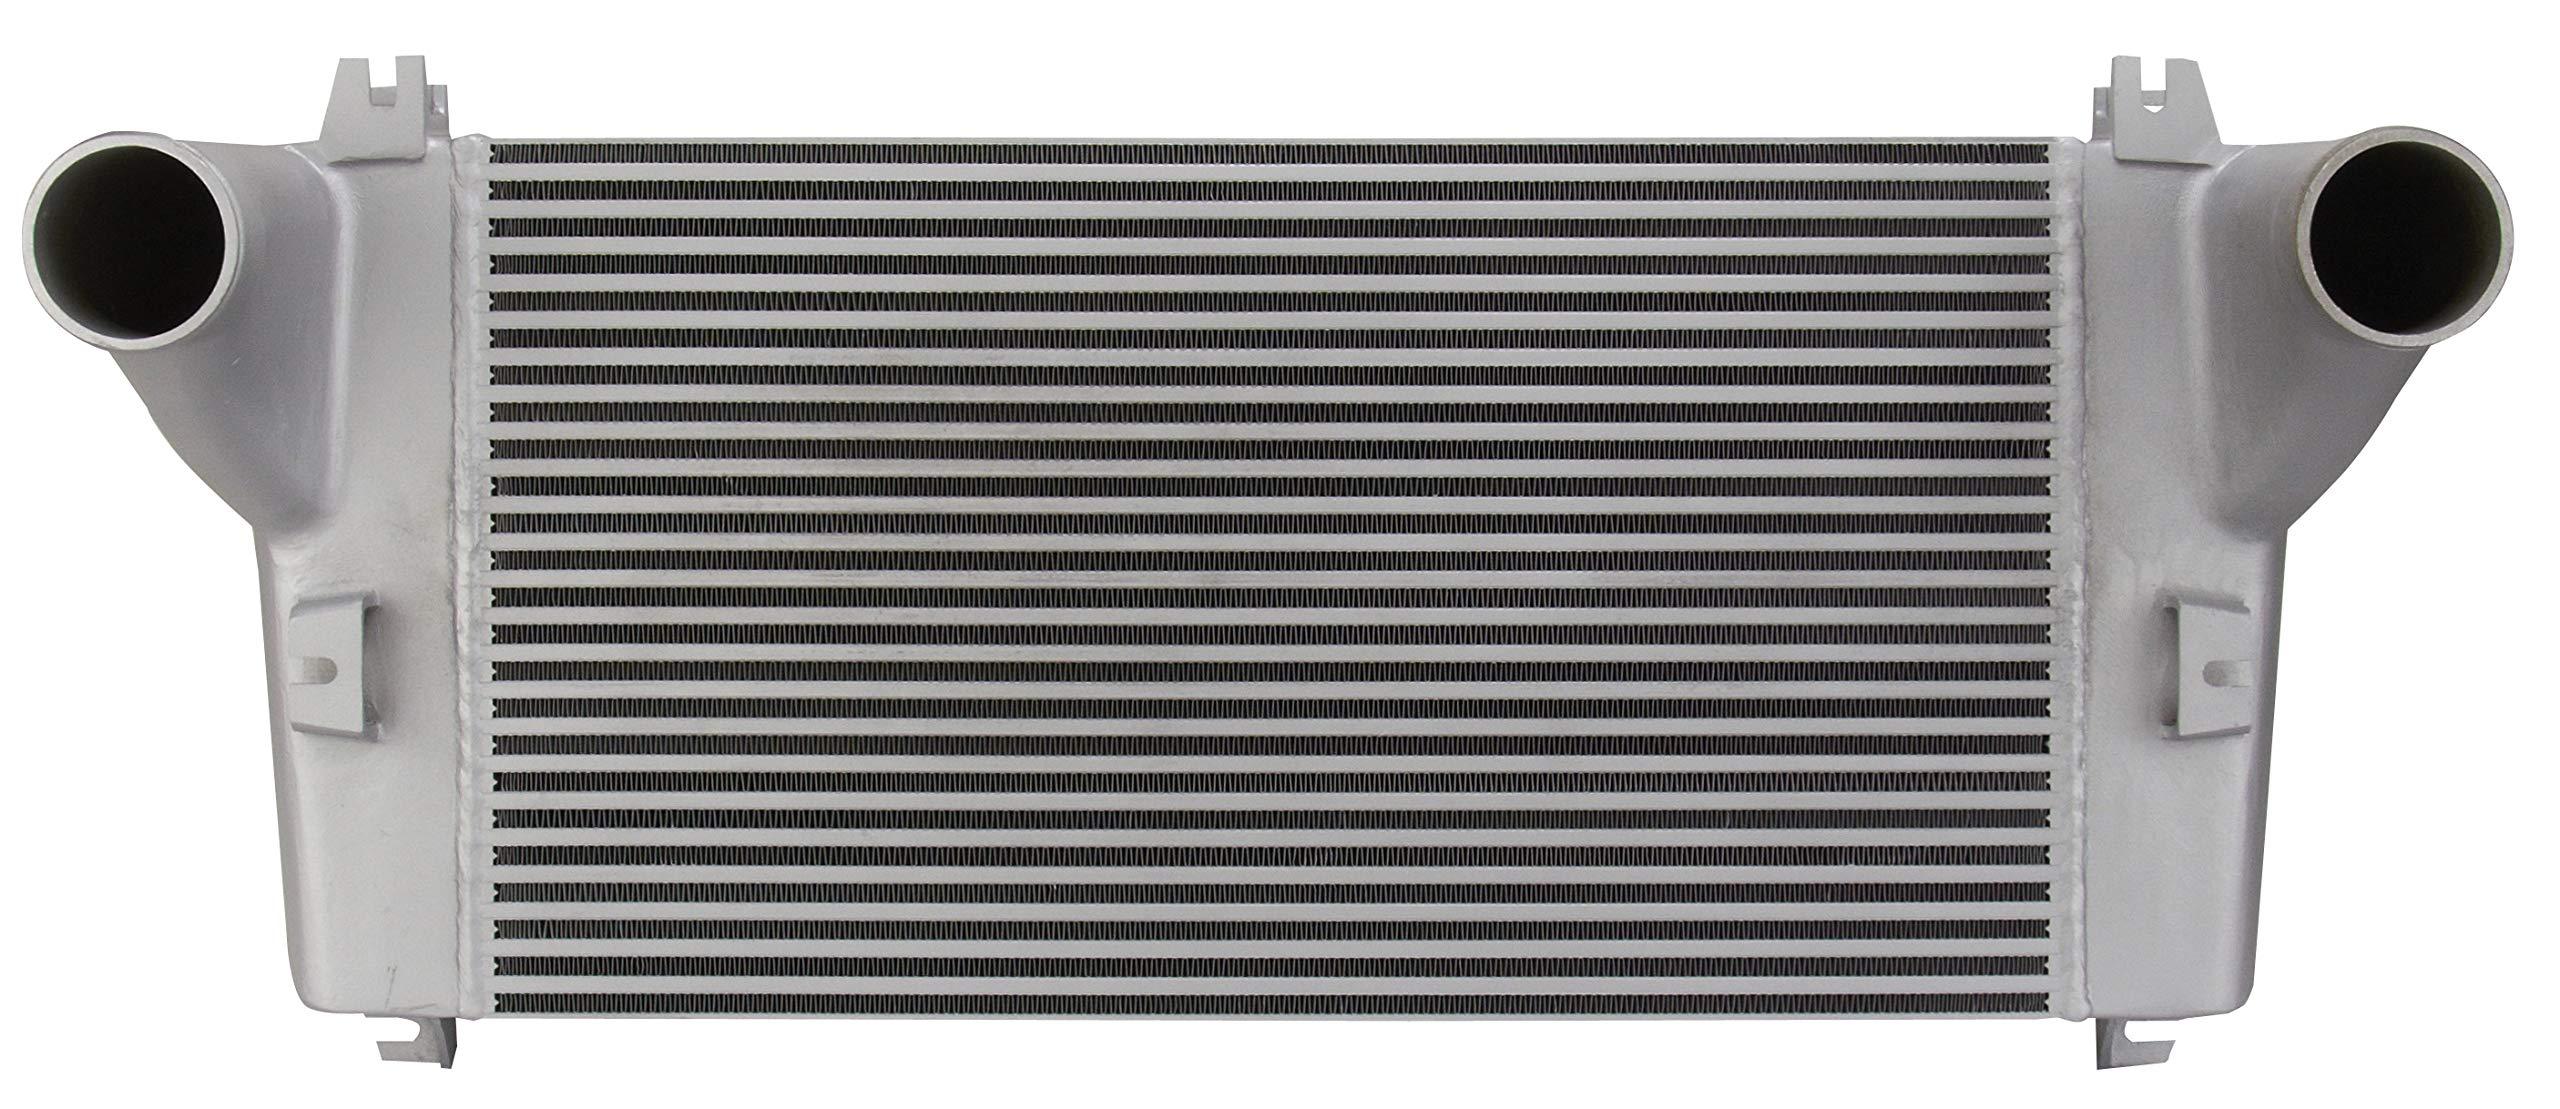 Spectra Premium 4401-1718 Turbocharger Intercooler